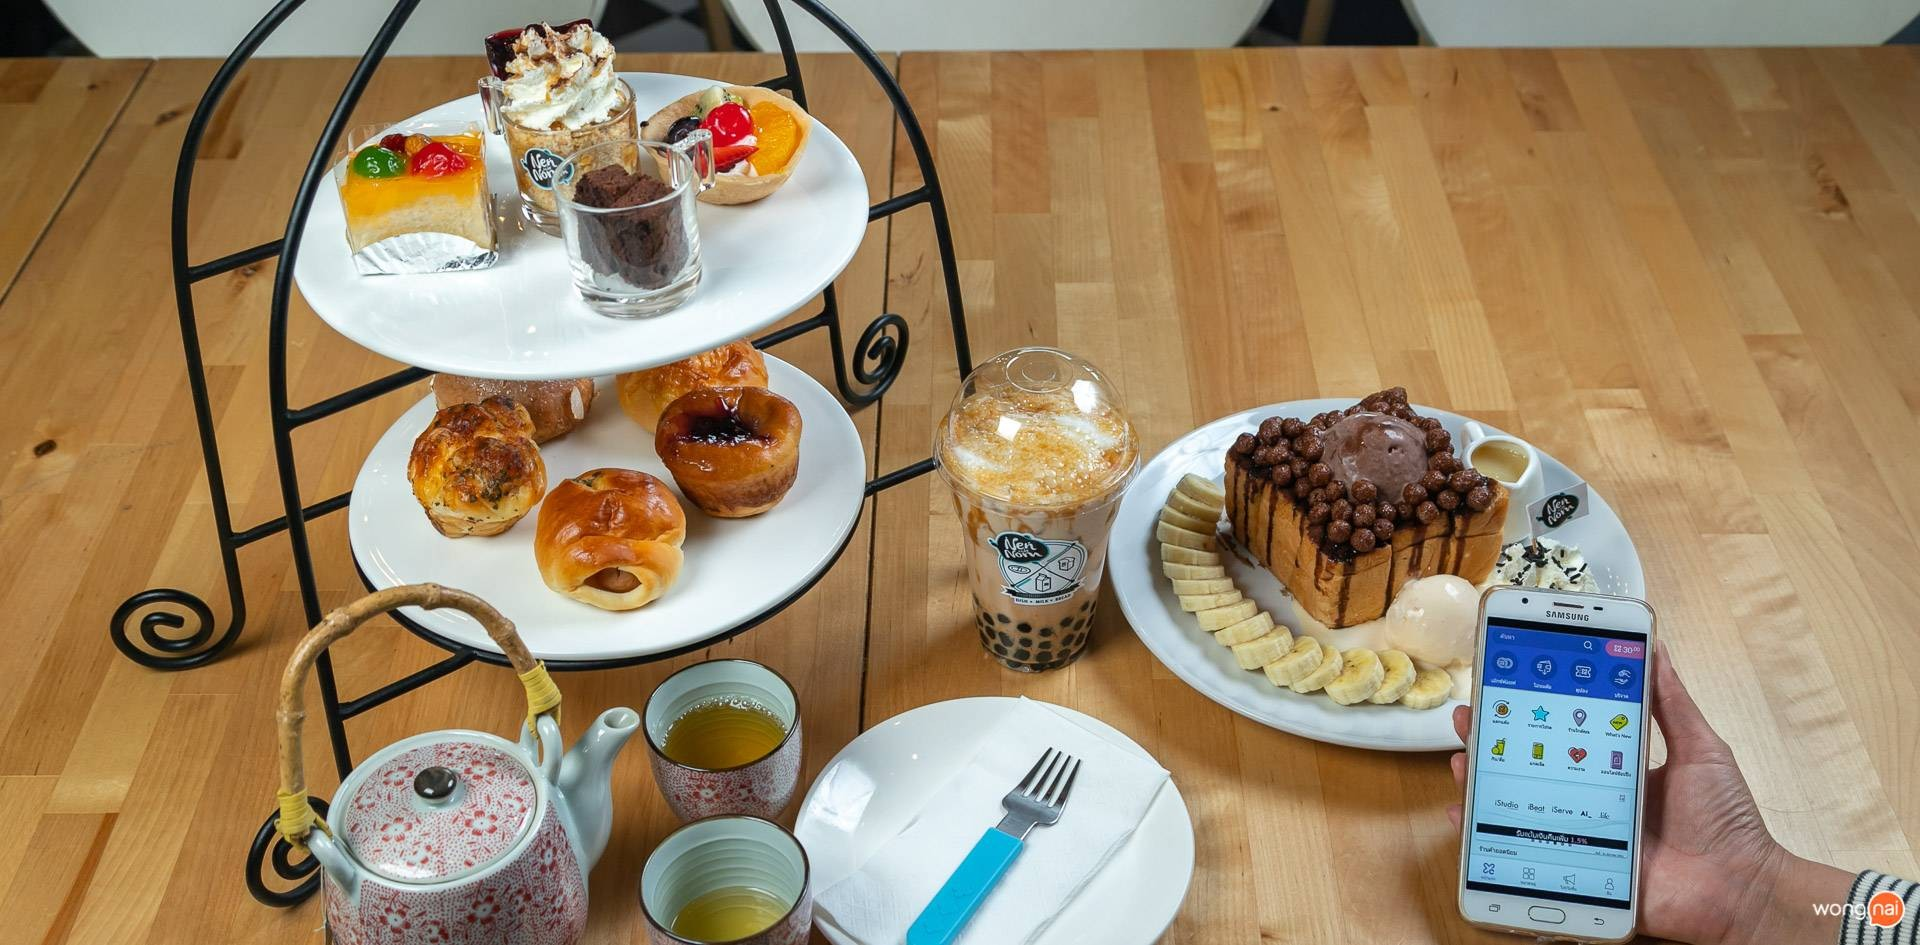 NenNom Cafe'(เน้นนมคาเฟ่) พุทธมณฑลสาย 1